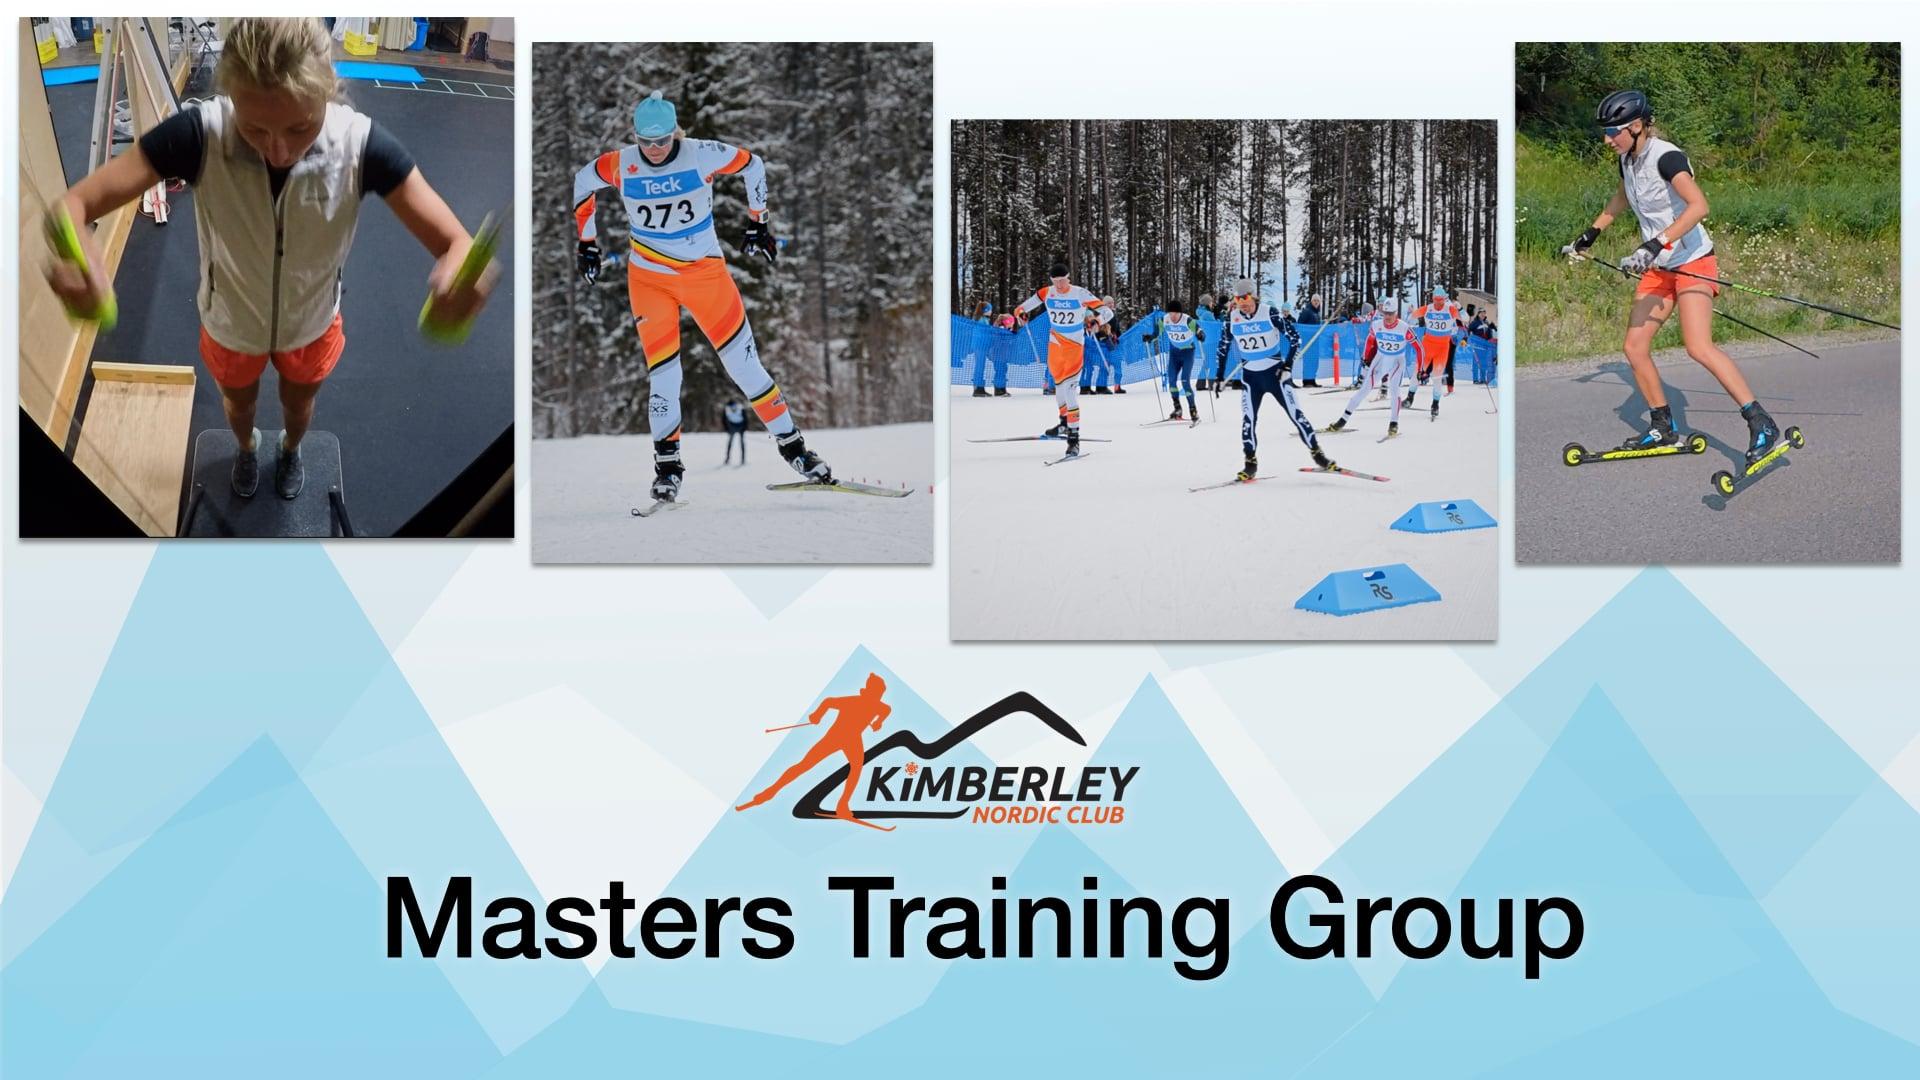 Masters Training Group